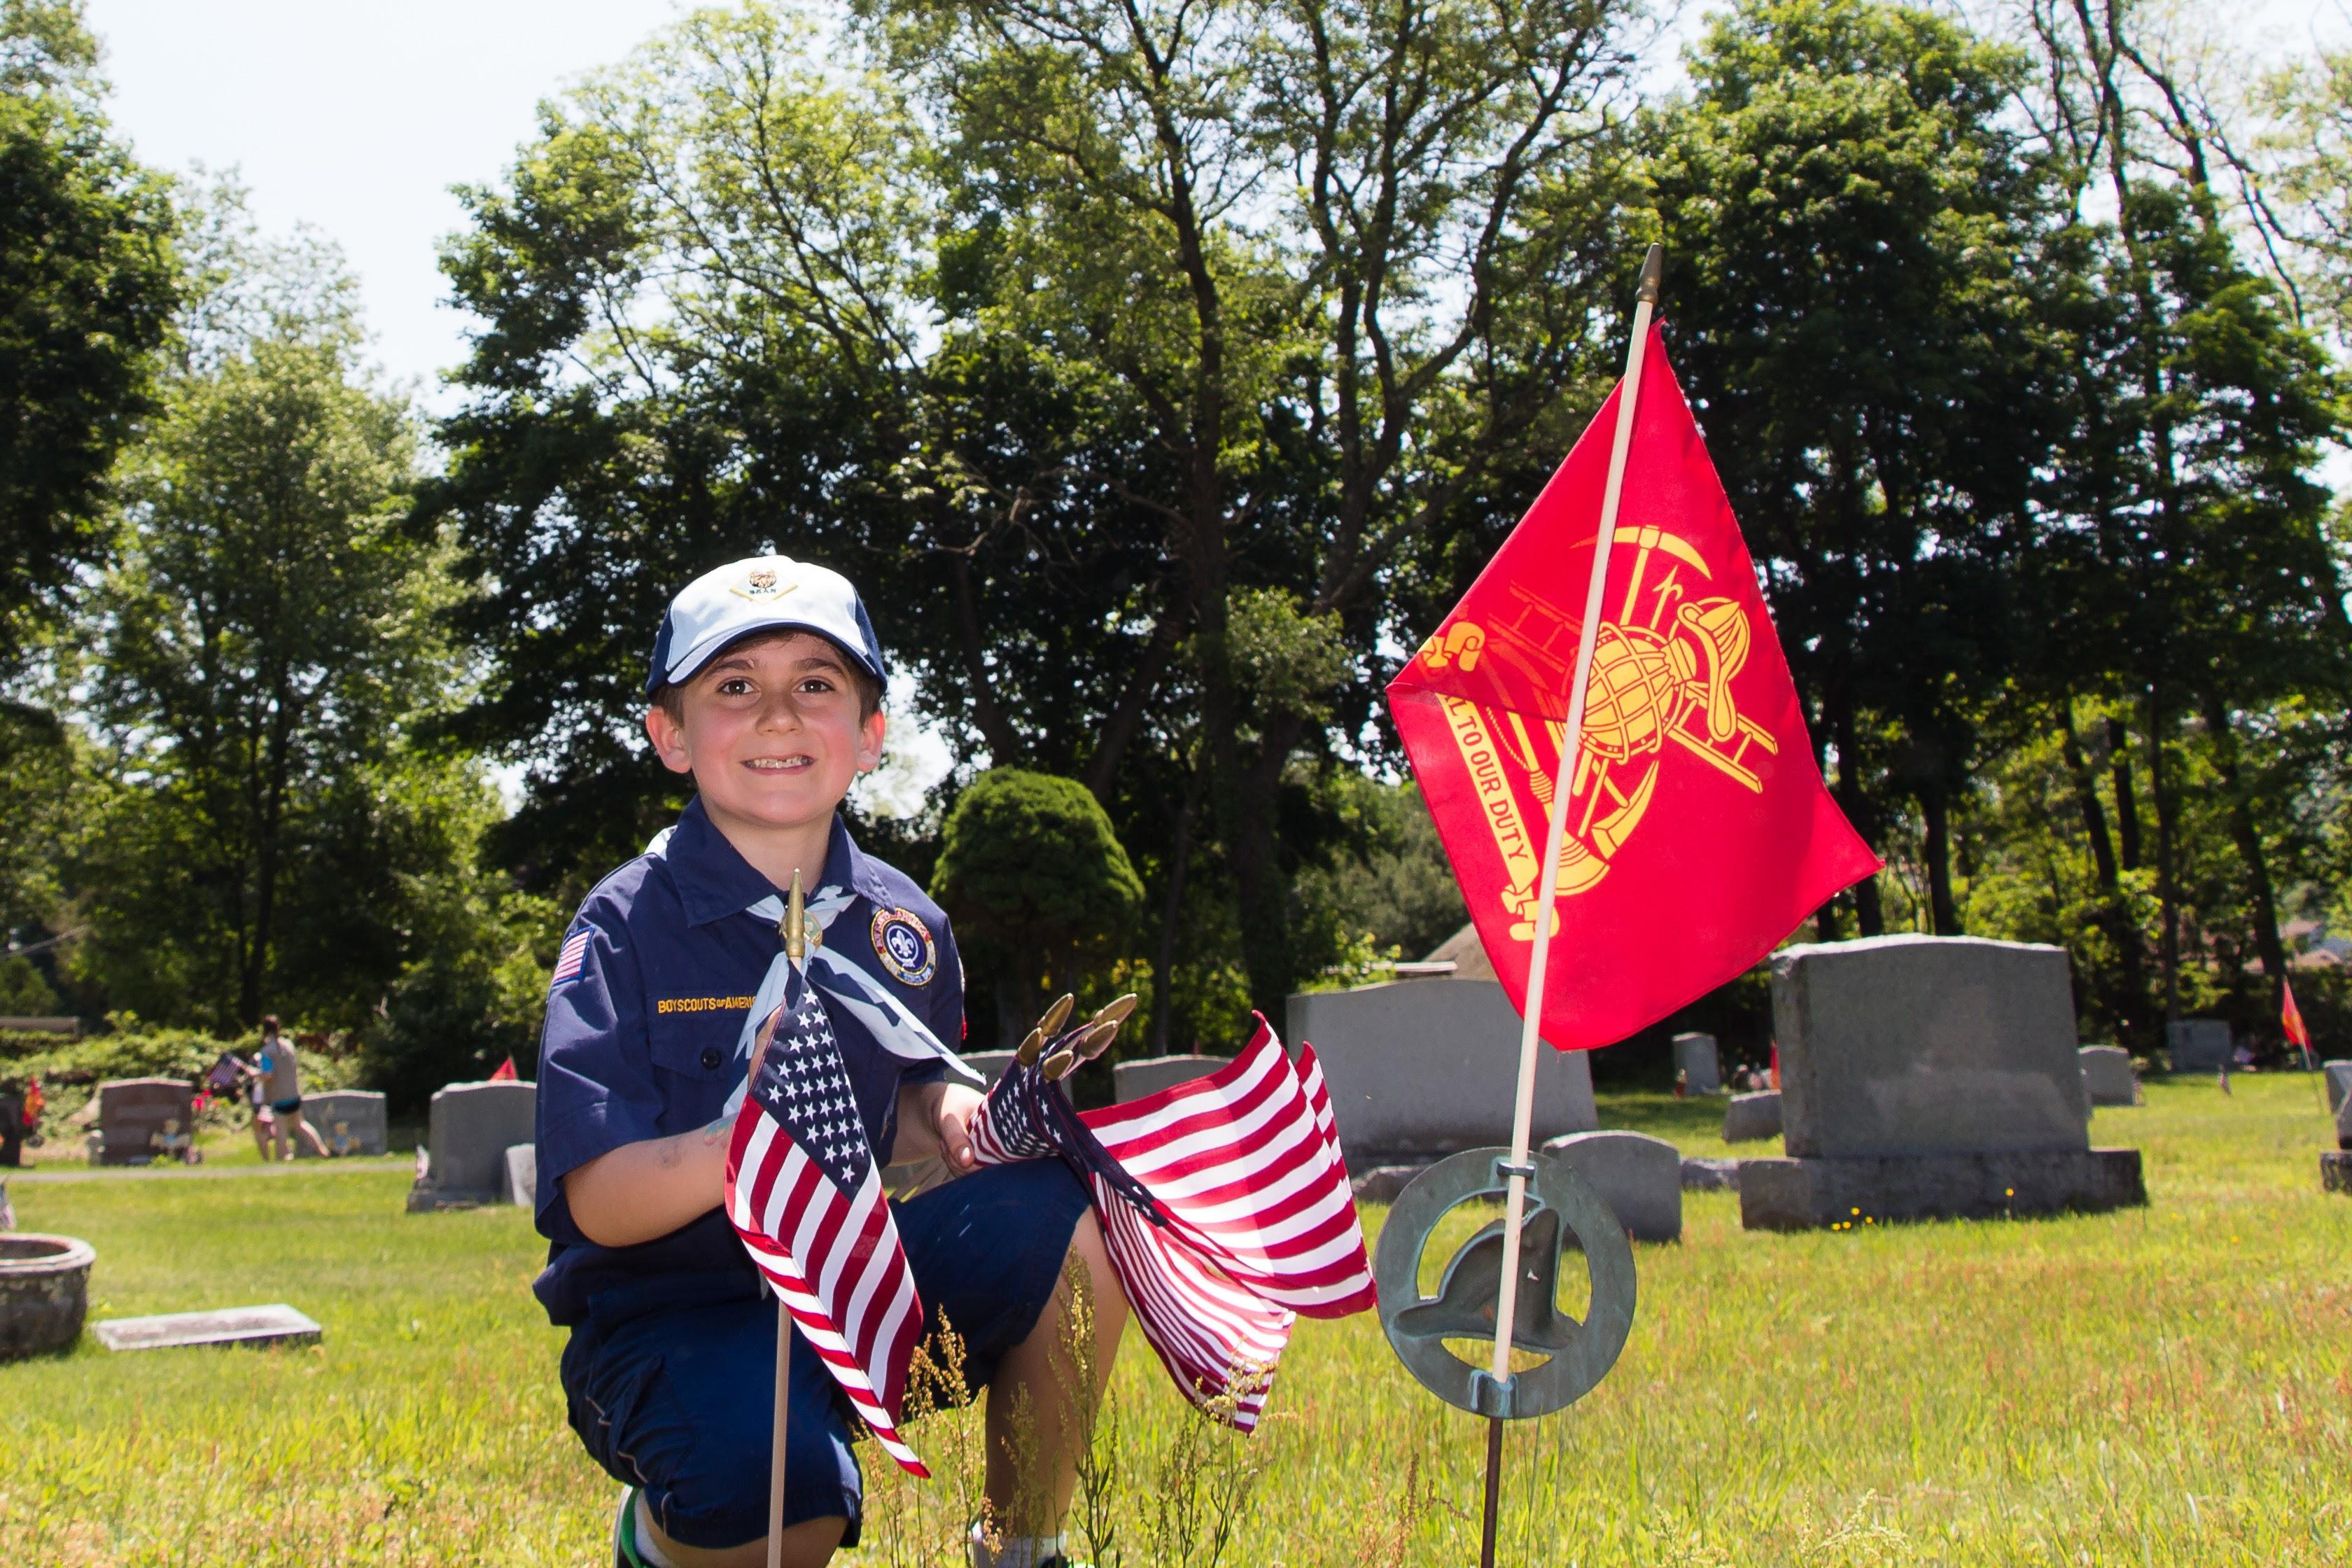 30a238413fec012db5d0_20160528_Boy_Scouts_Memorial_Day_Flag_Settng_081.jpg